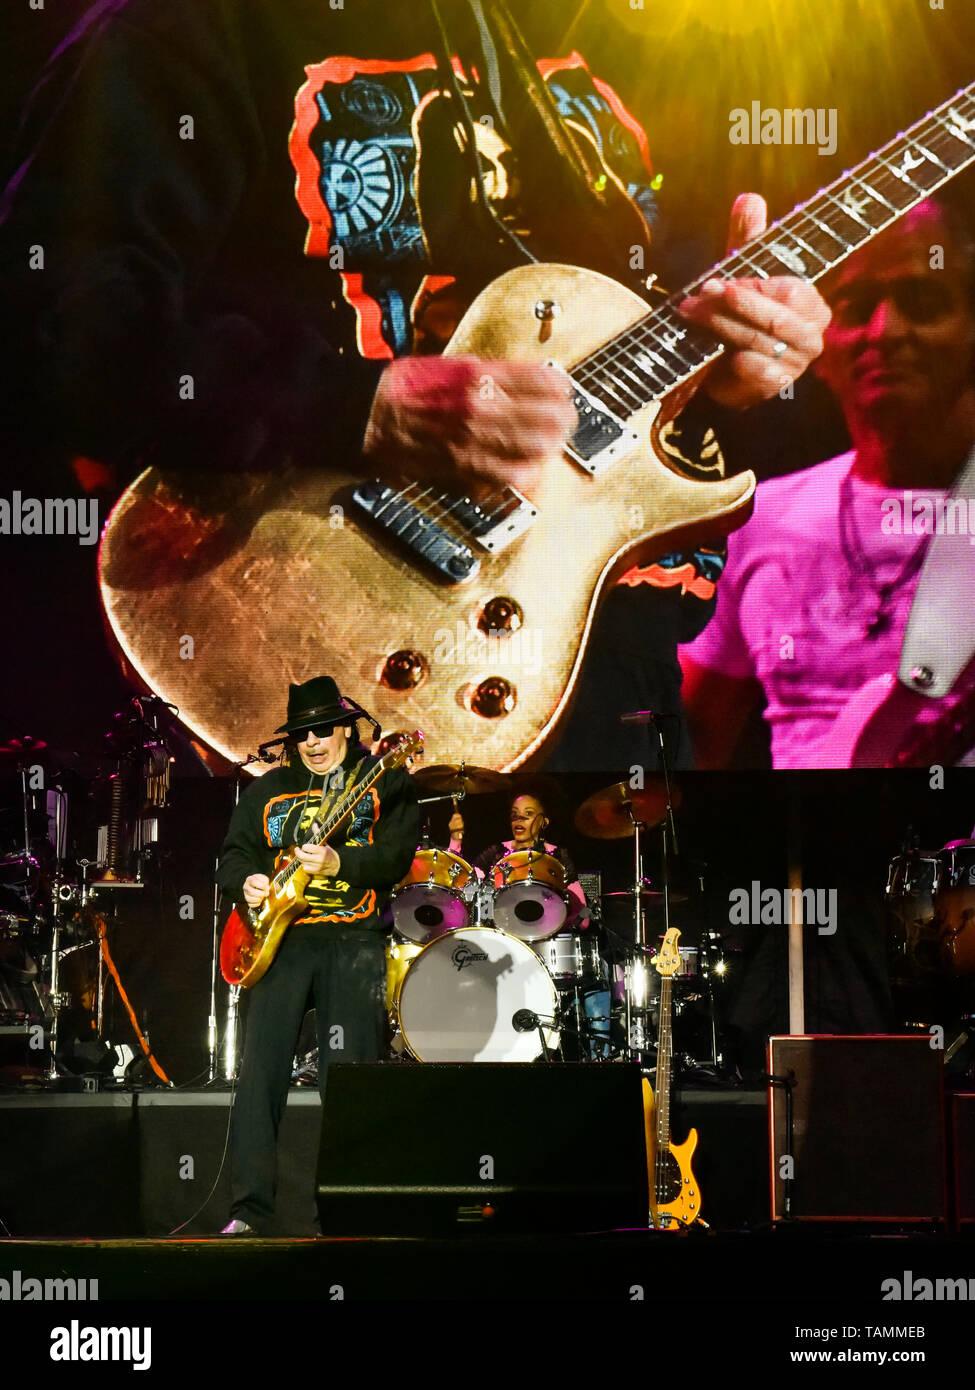 Napa, USA. 26th May, 2019. Napa, California, May 26, 2019, Carlos Santana on stage at the 2019 Bottle Rock Festival, Day3 BottleRock Credit: Ken Howard/Alamy Live News Stock Photo